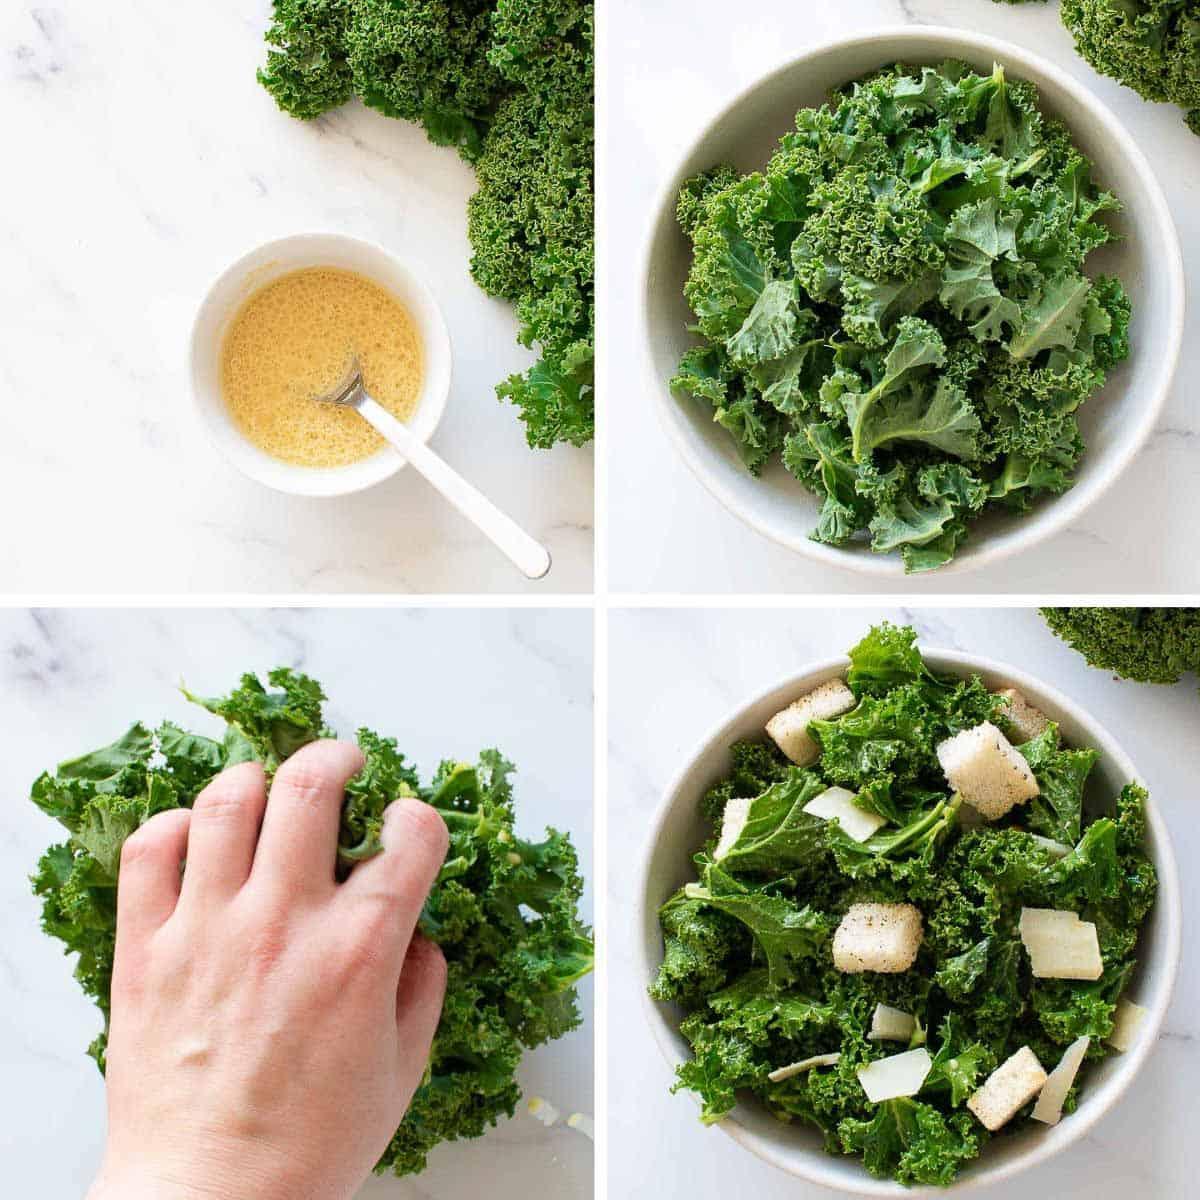 Step by step images showing how to make vegetarian kale caesar salad.